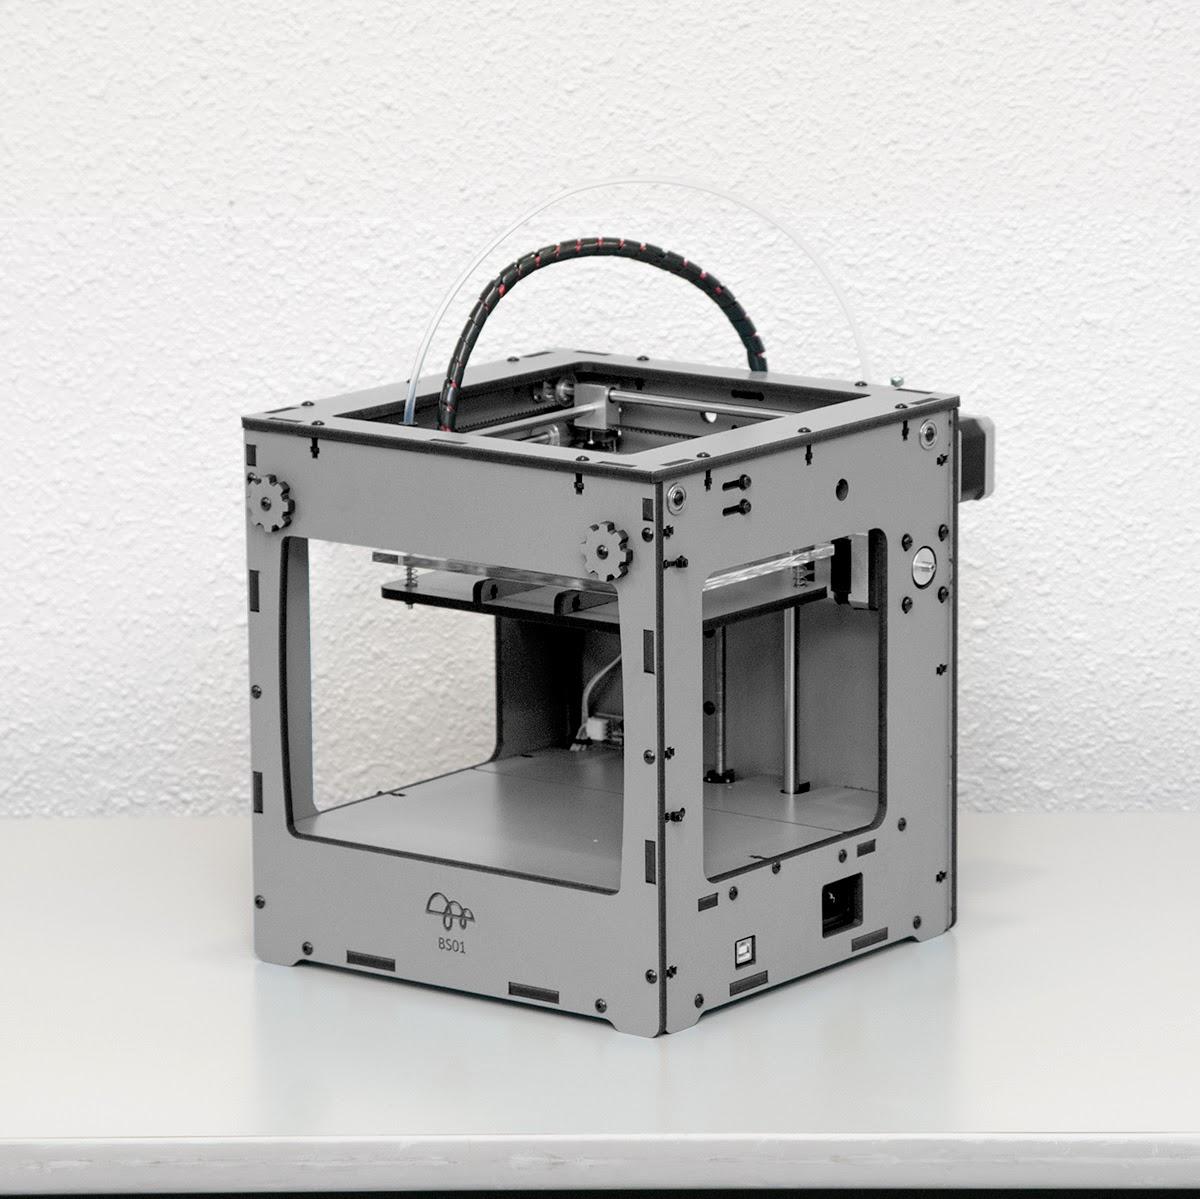 3Dプリンタ初心者が国産3Dプリンタ「BS01 BONSAI Mini」を選択するべき10の理由